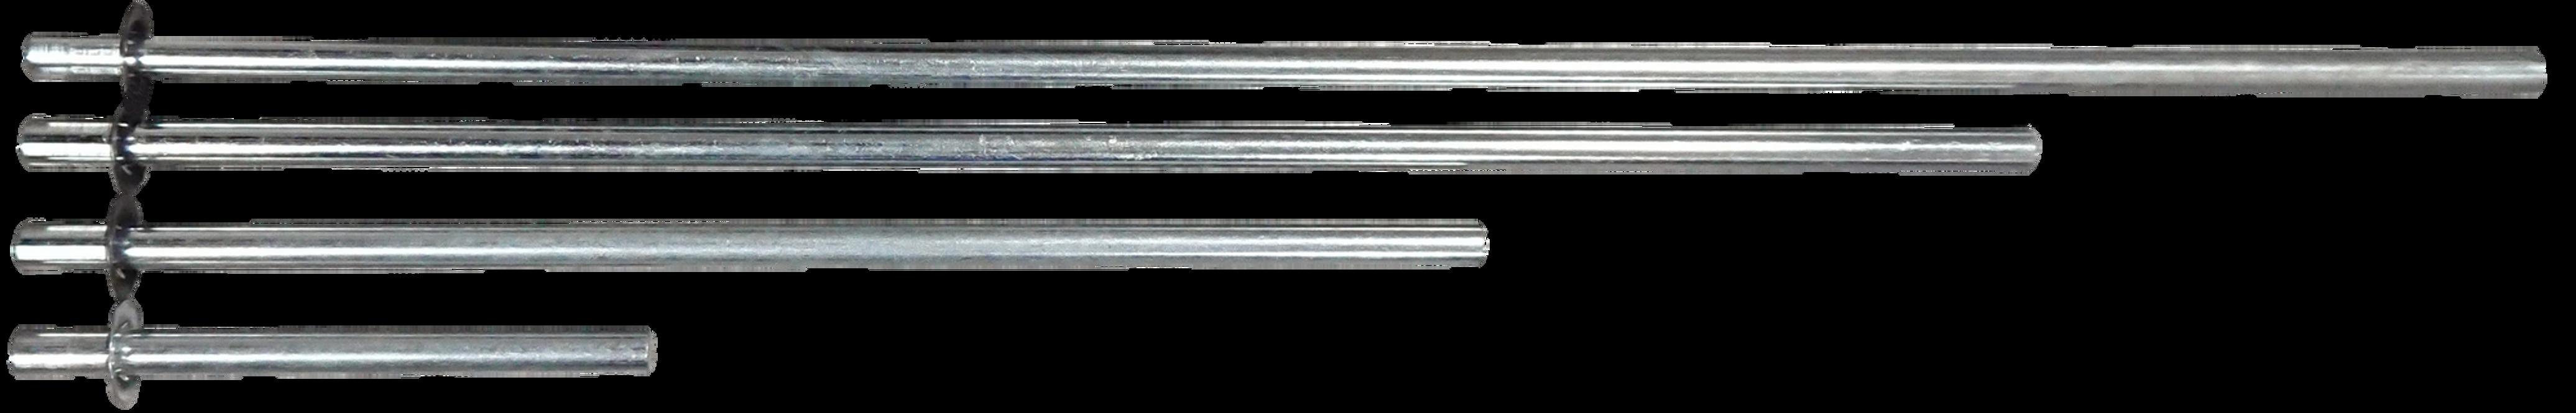 pk4 pulling rods